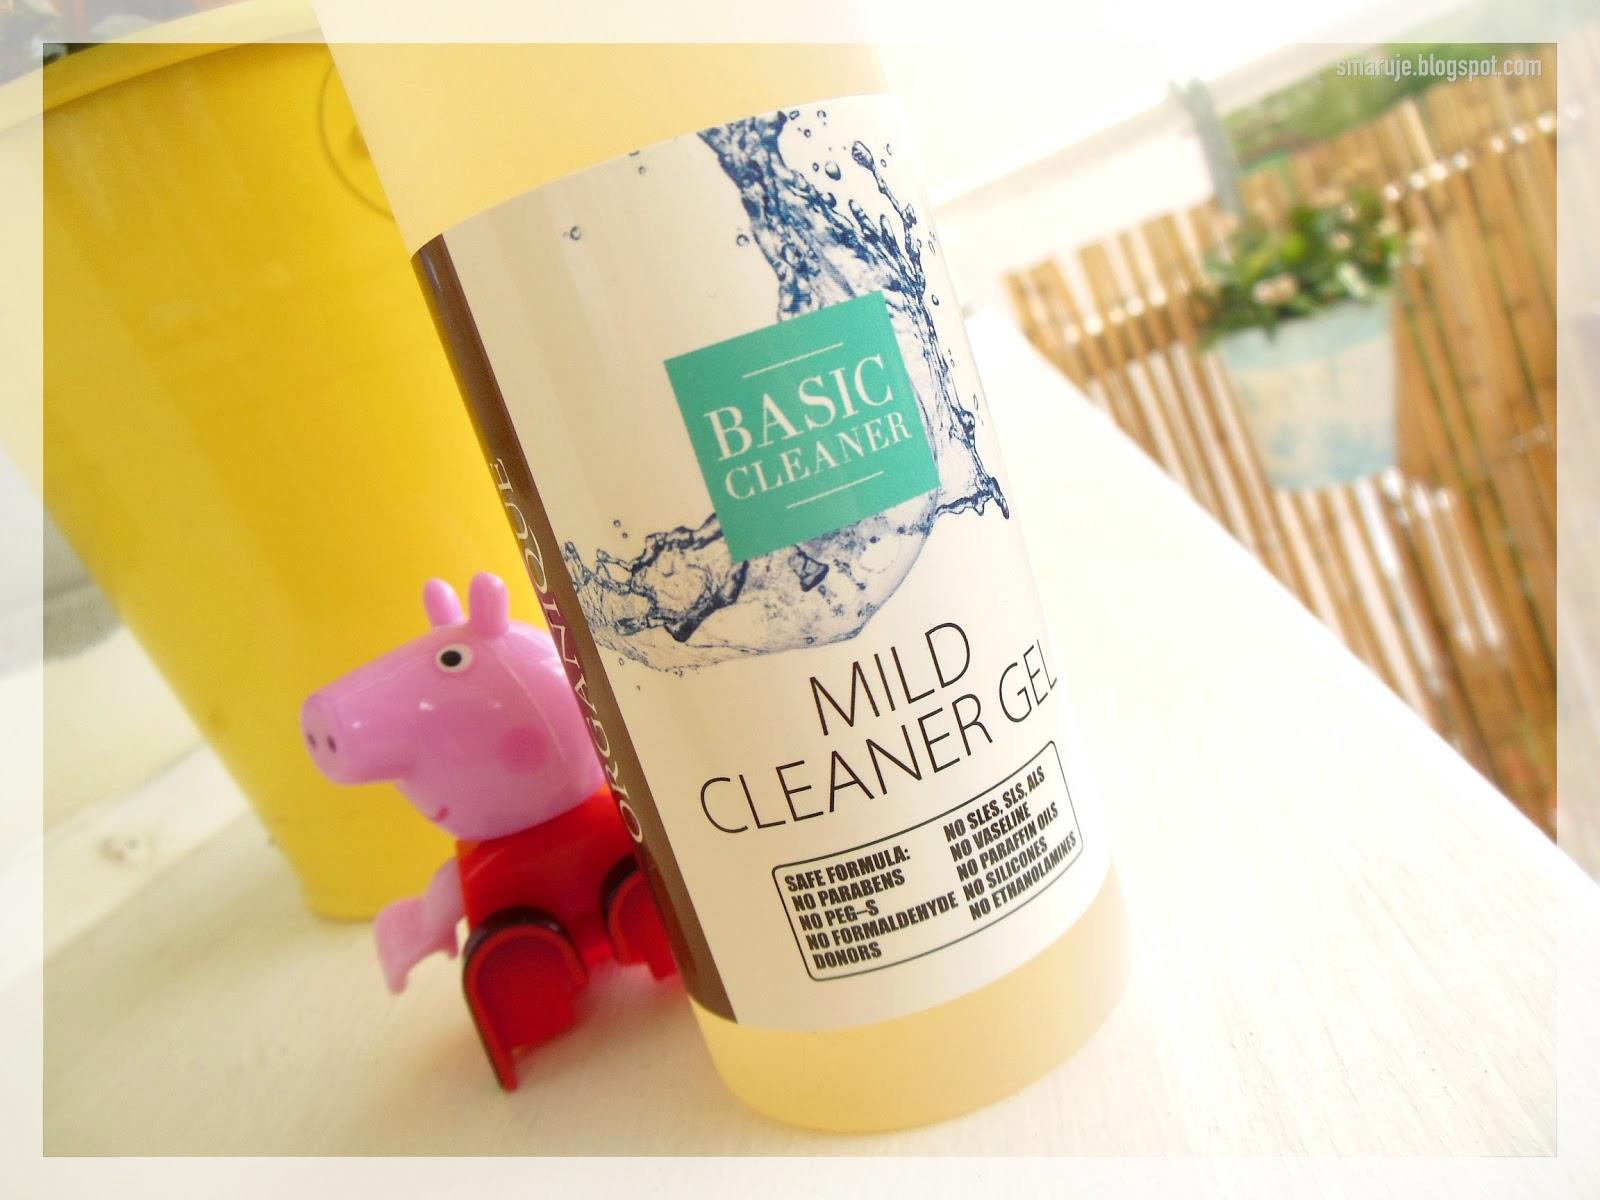 Nie taki łagodny, jak go malują: Organique –Basic Cleaner –Mild Cleaner Gel